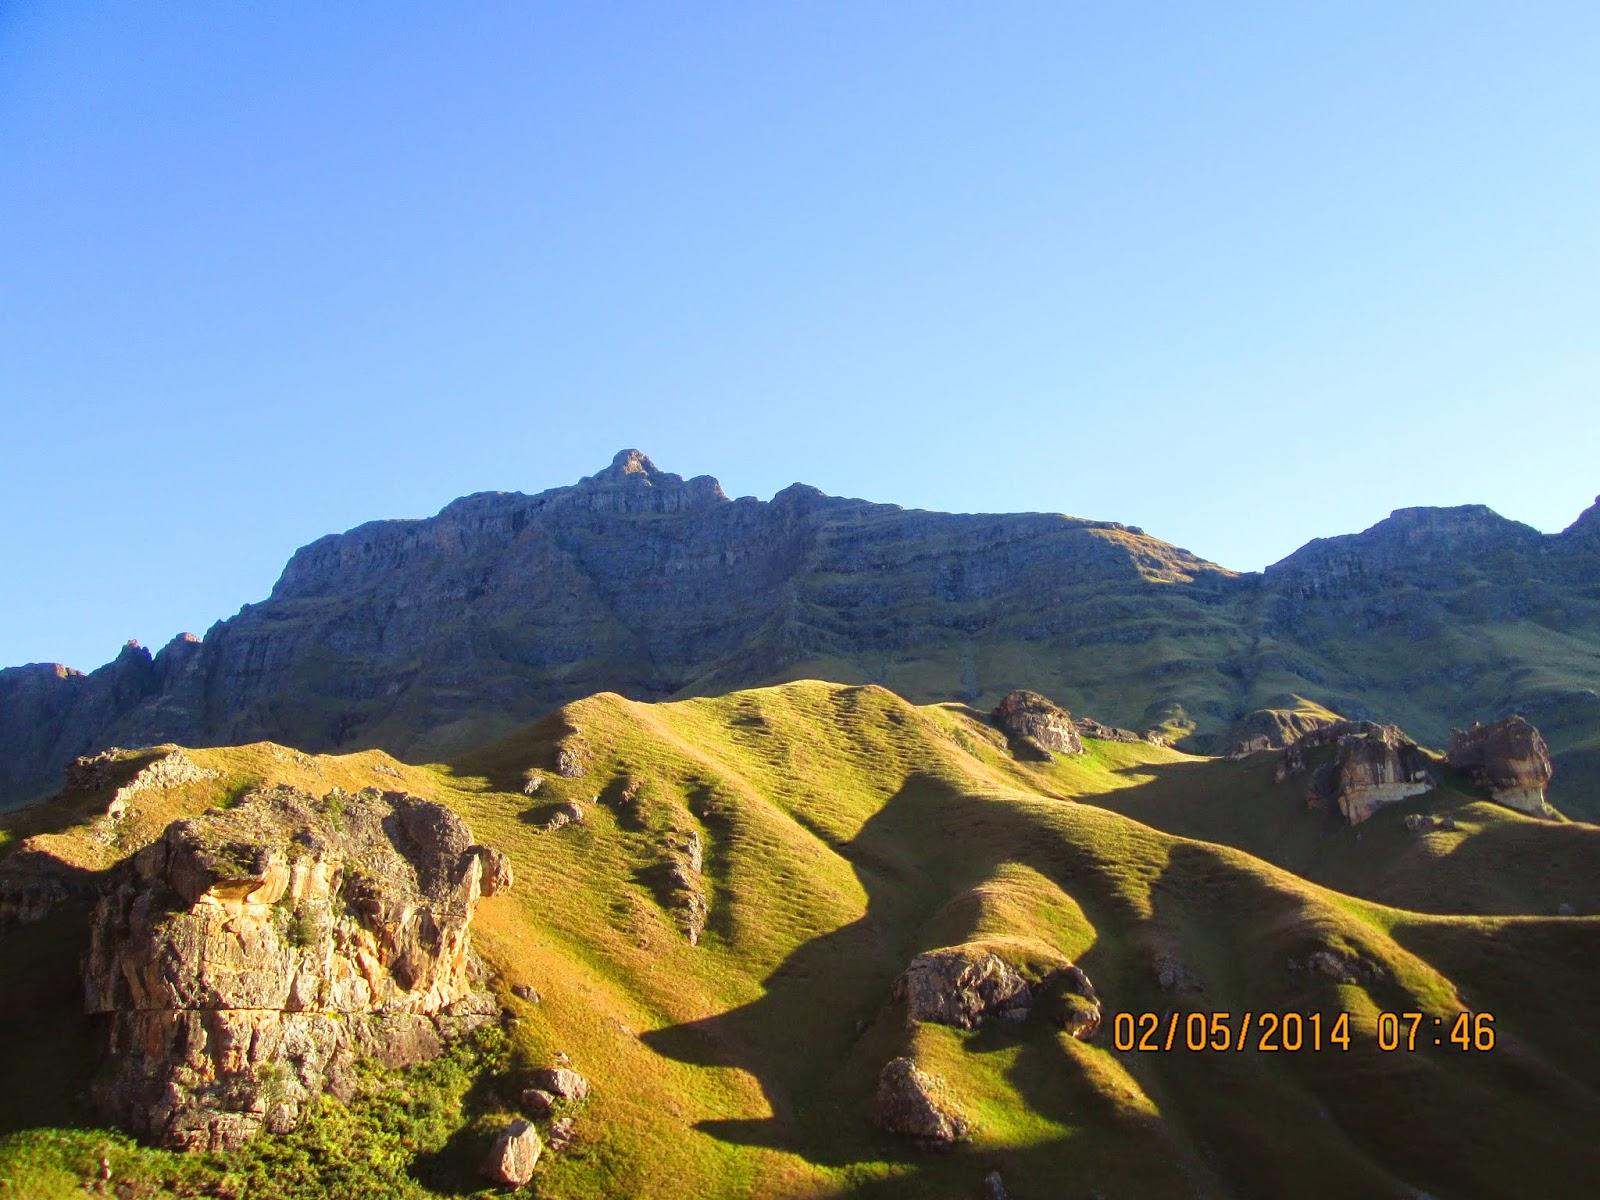 KZN green mountains and shadows